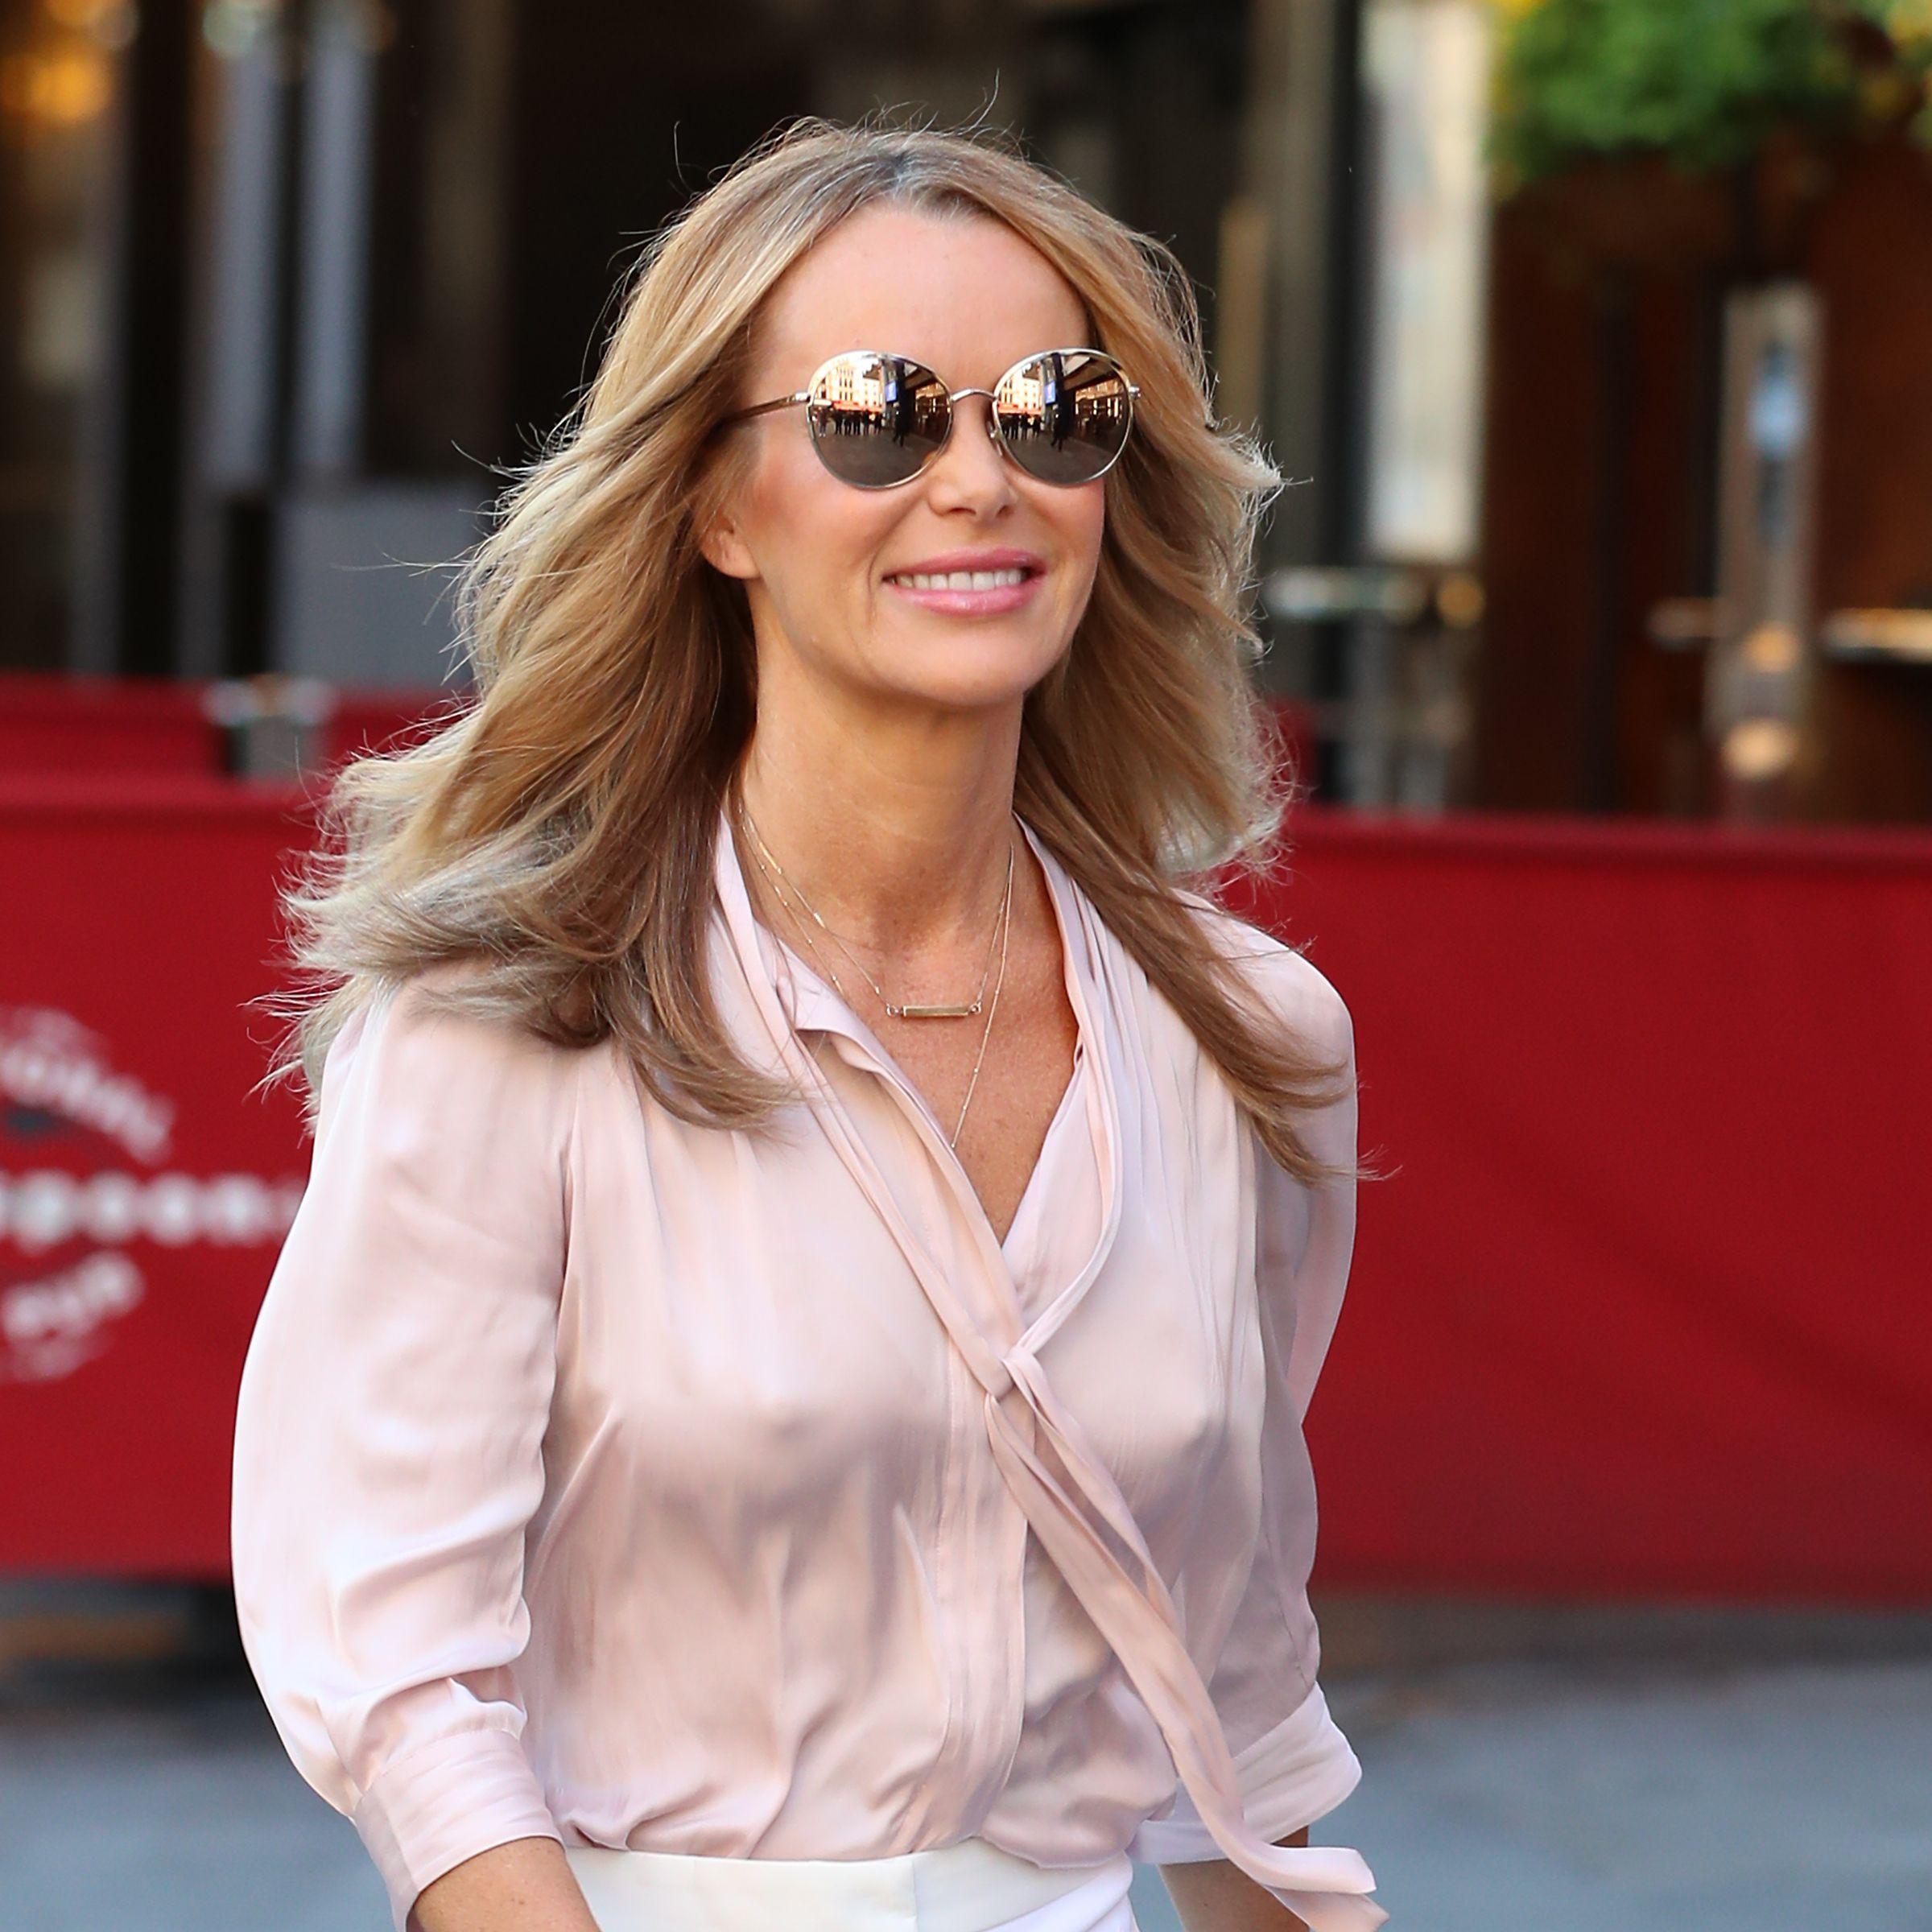 Amanda Holden's £39.99 Zara polka-dot dress is perfect summer chic